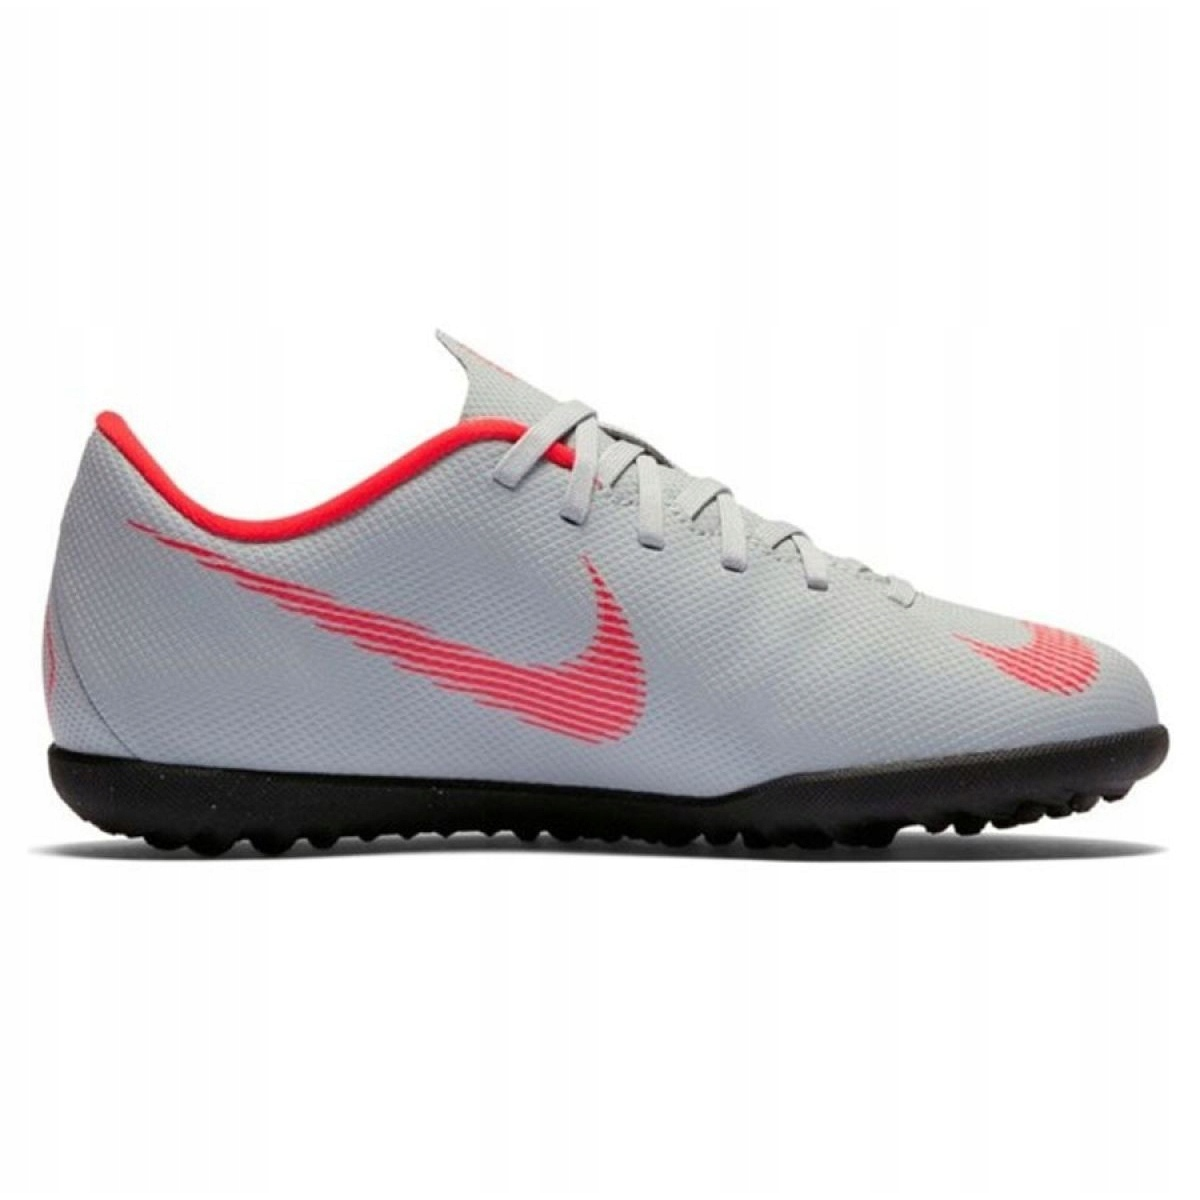 Nike Mercurial VaporX 12 chuteiras de futebol Tf Gs Jr AH7355 060 cinza prata branco